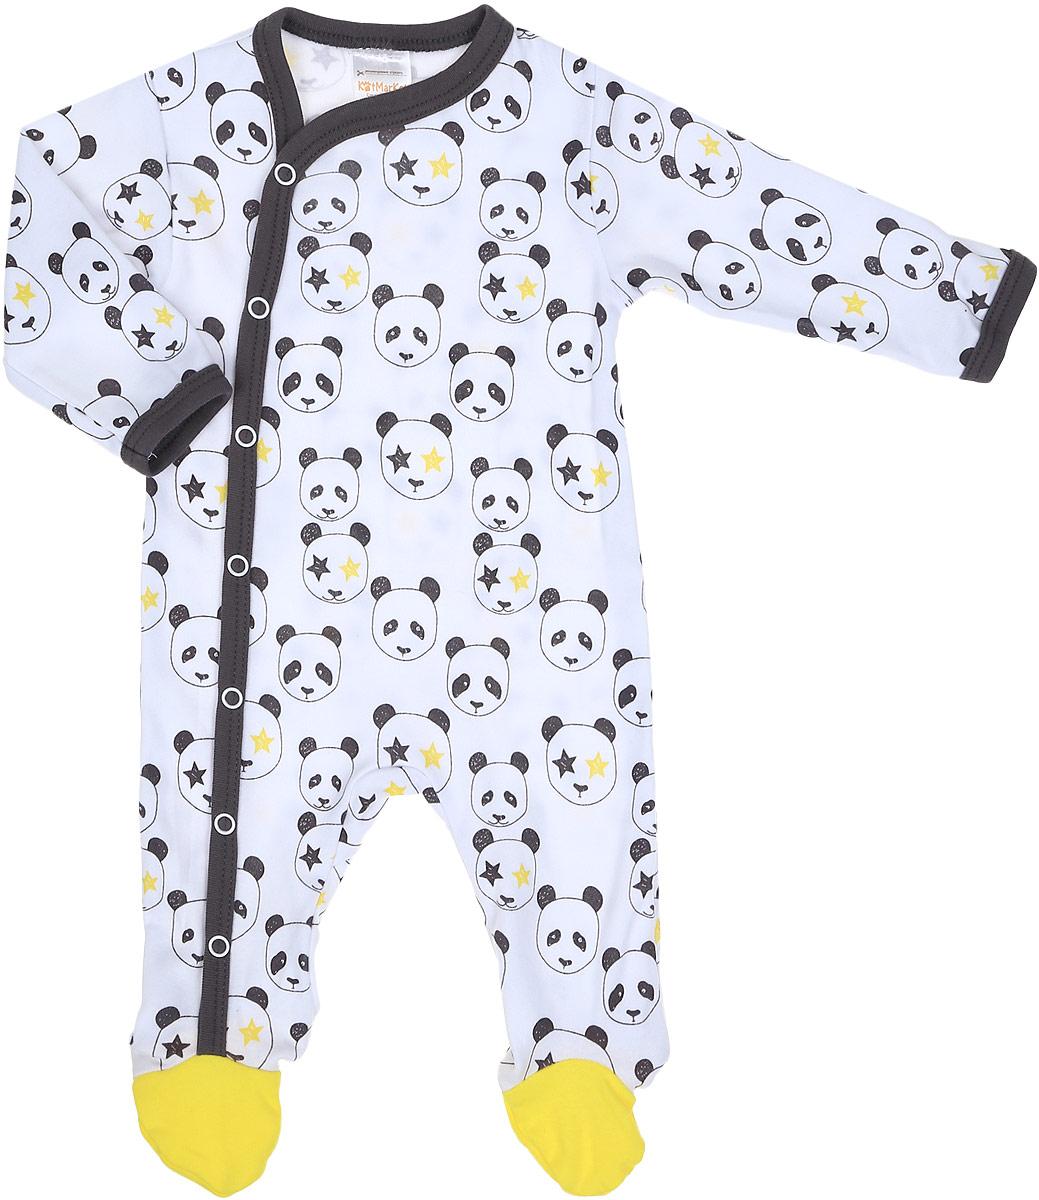 Комбинезон домашний детский КотМарКот Панда Rock, цвет: светло-бежевый, желтый. 6326. Размер 86